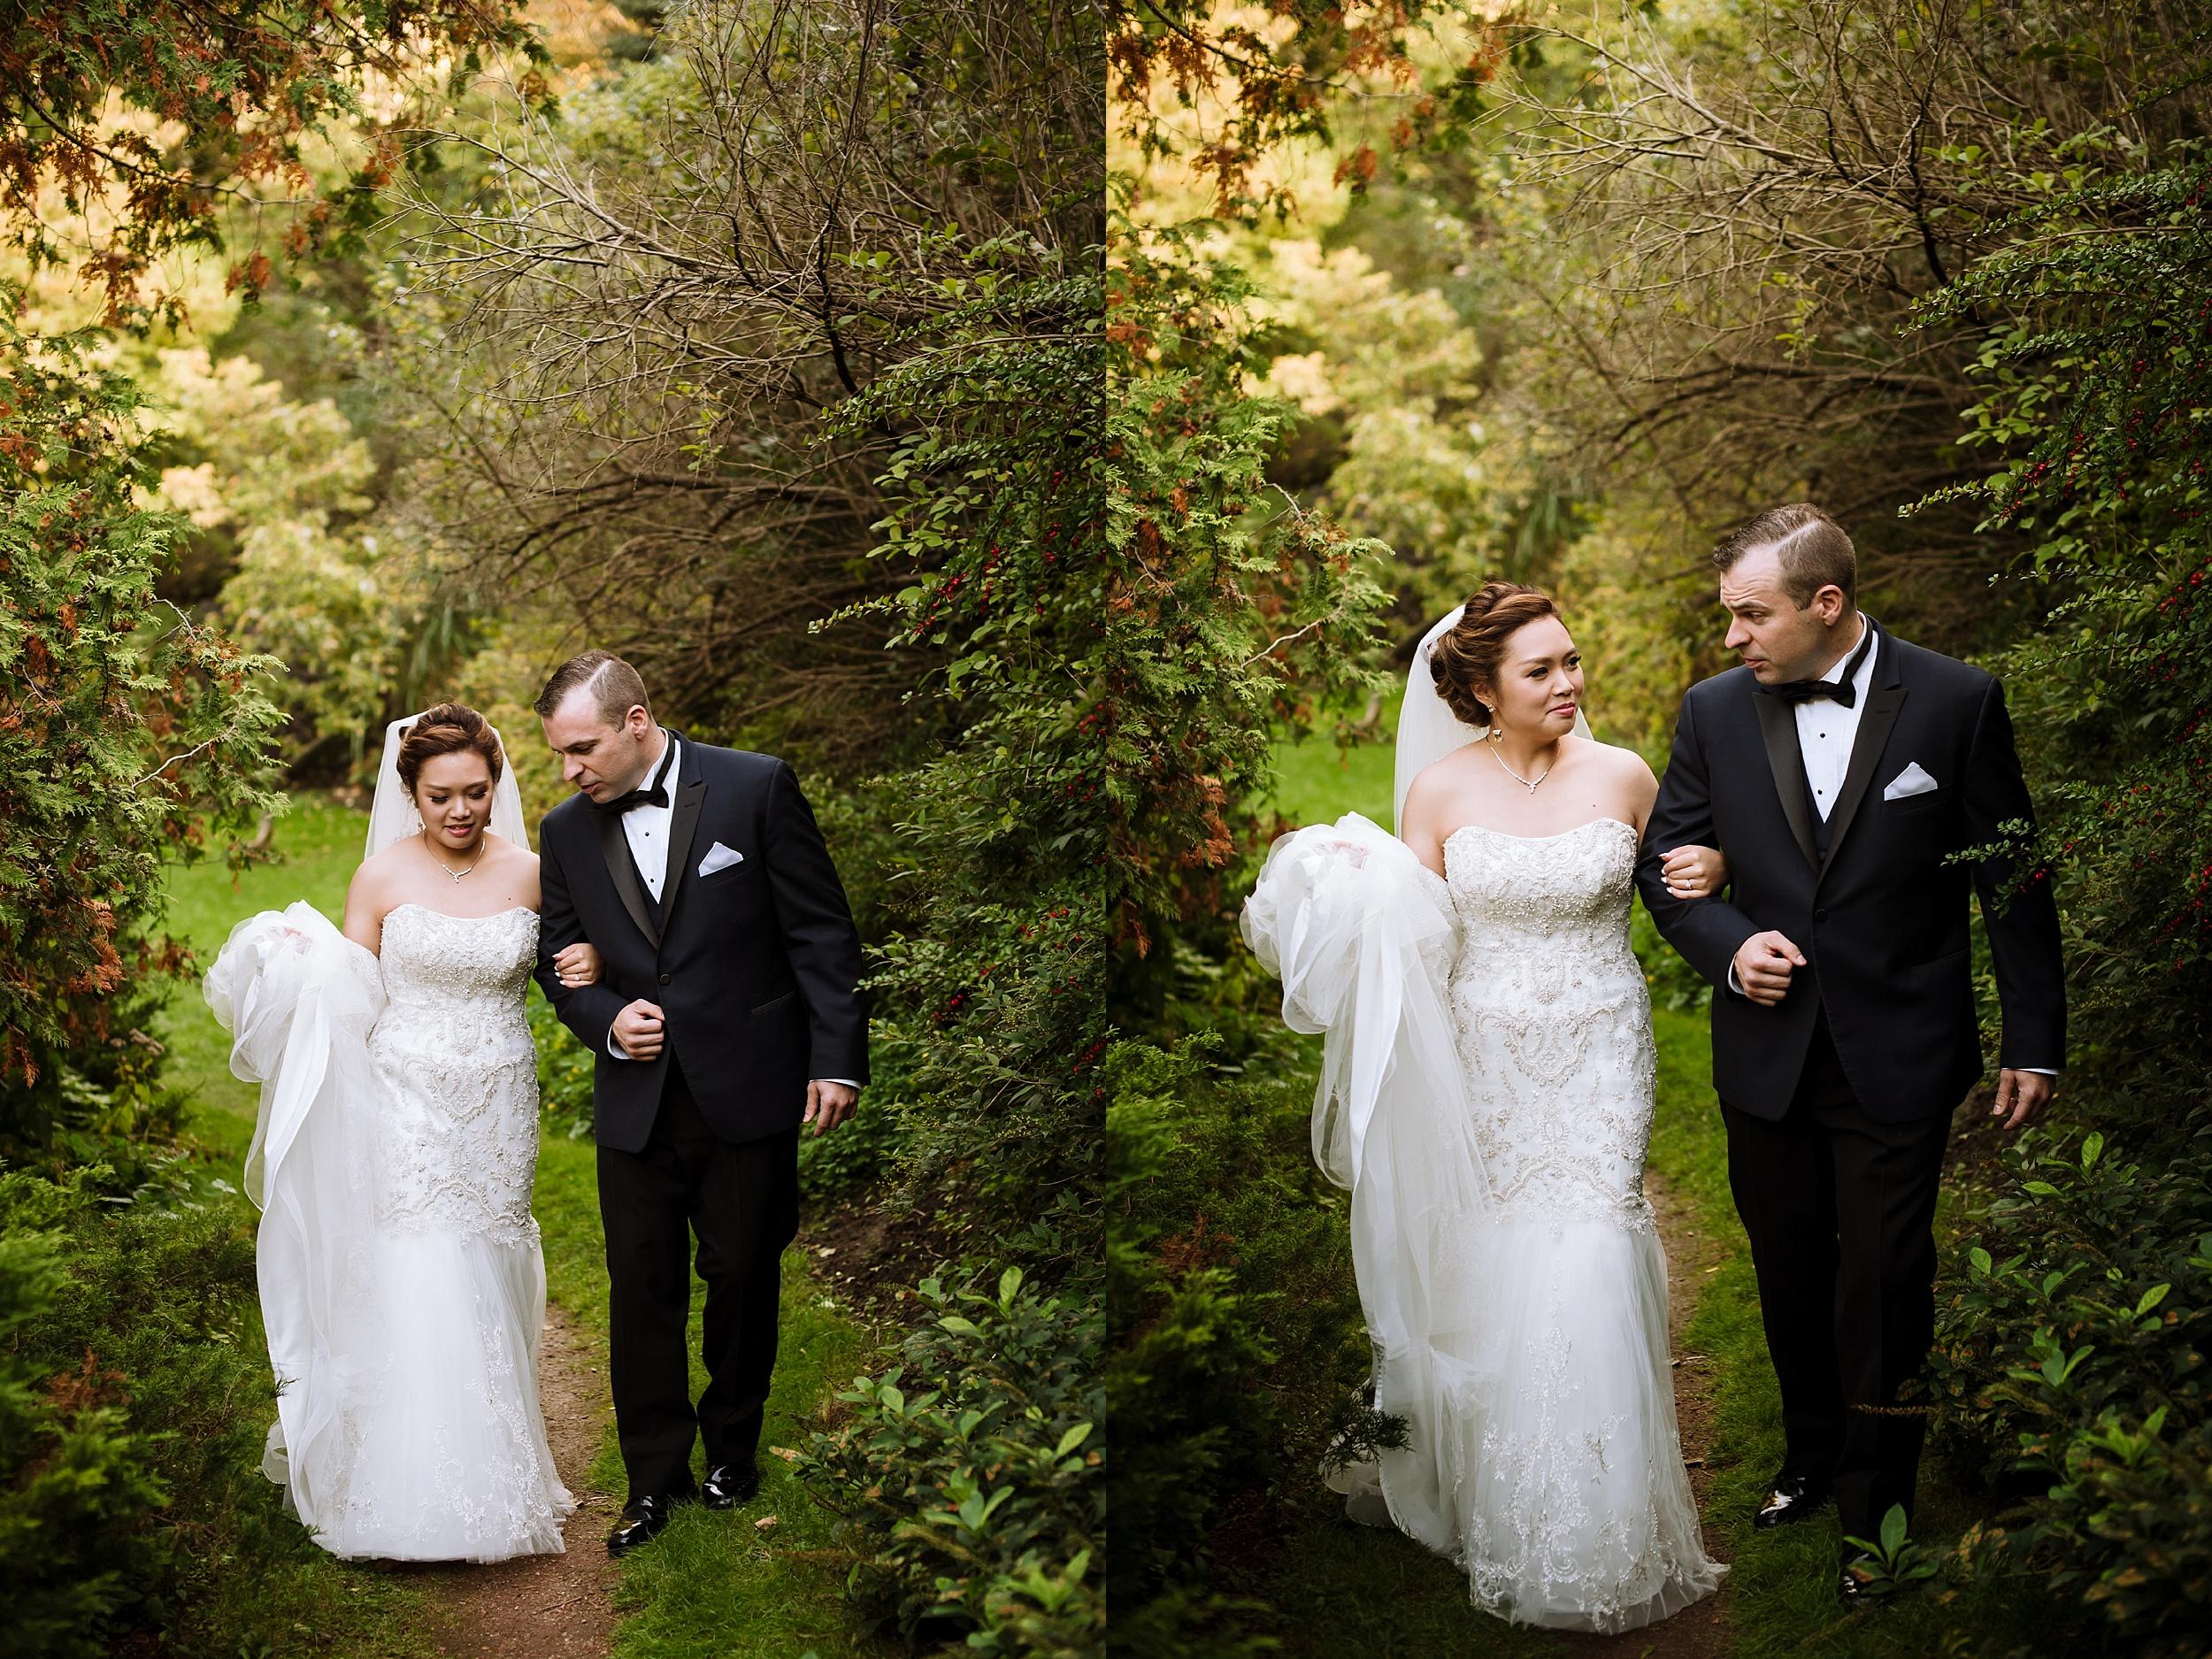 Sunnybrook_Estates_Alexander_Muir_Toronto_Wedding_Photographer_0010.jpg